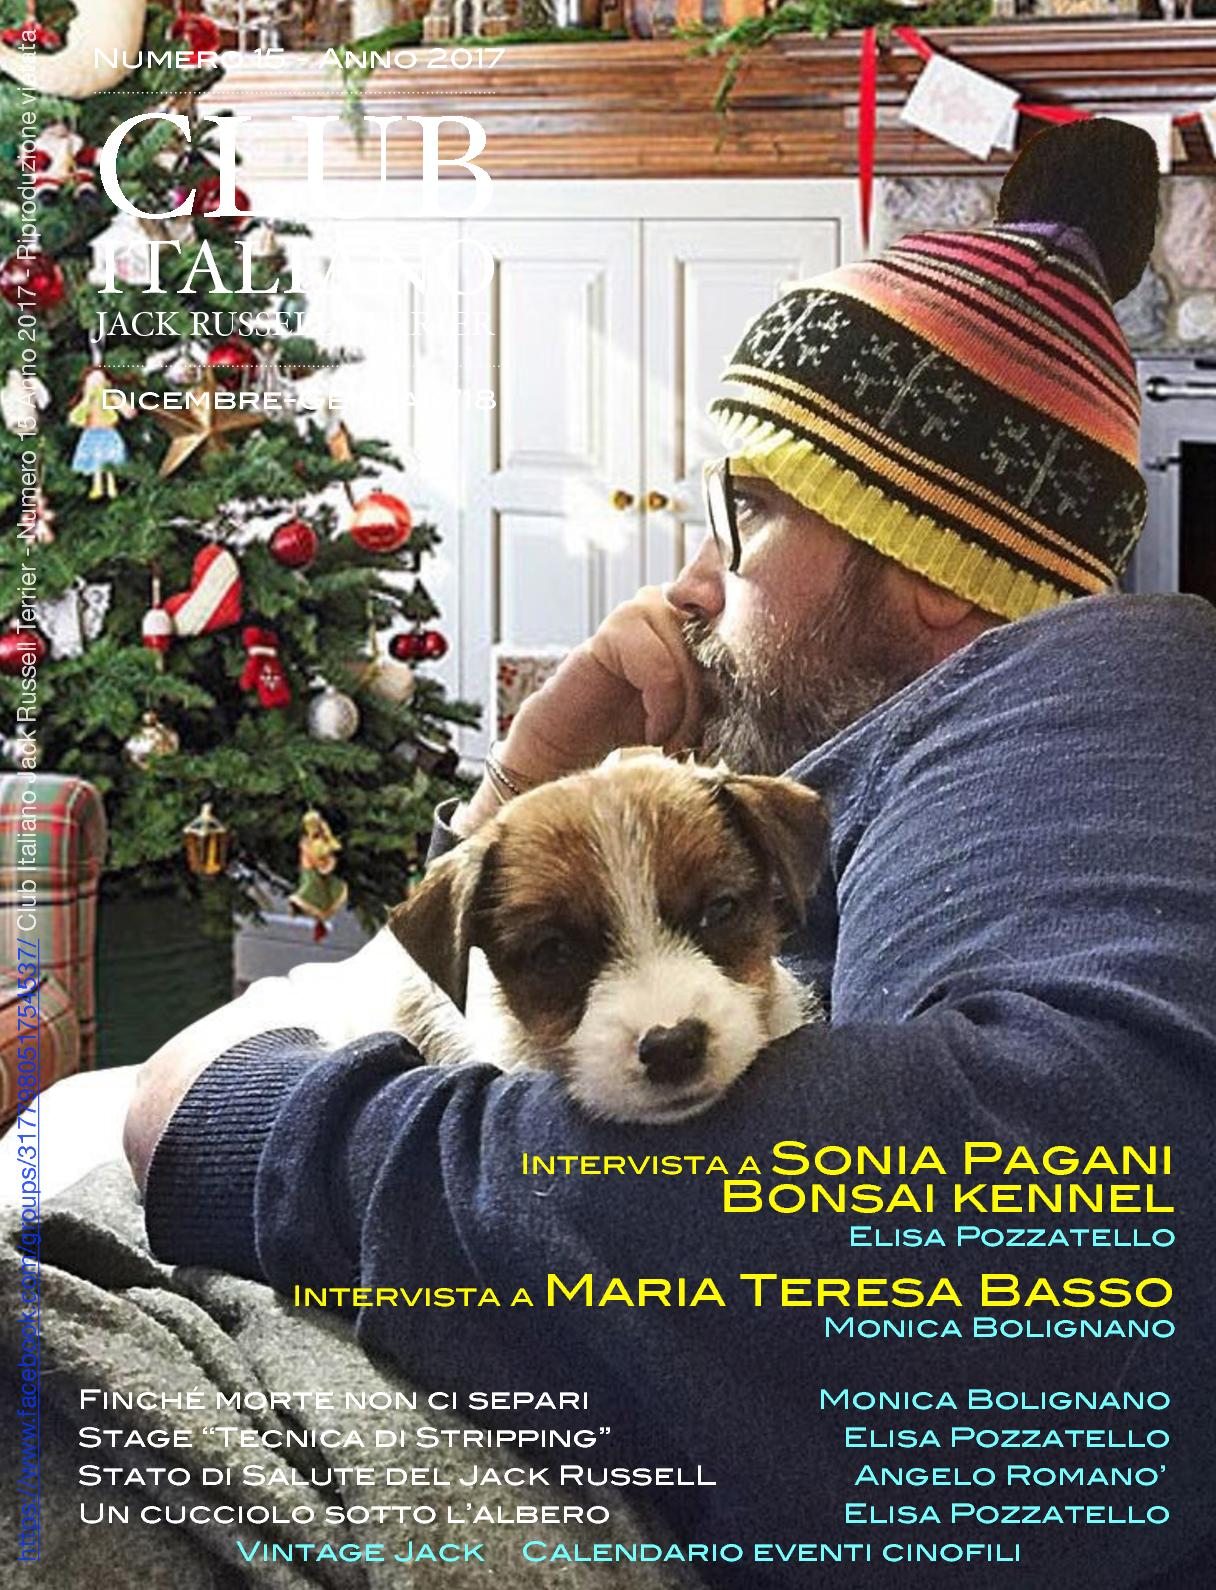 Expocani Calendario.Calameo Club Italiano Jack Russell Terrier N 15 2017